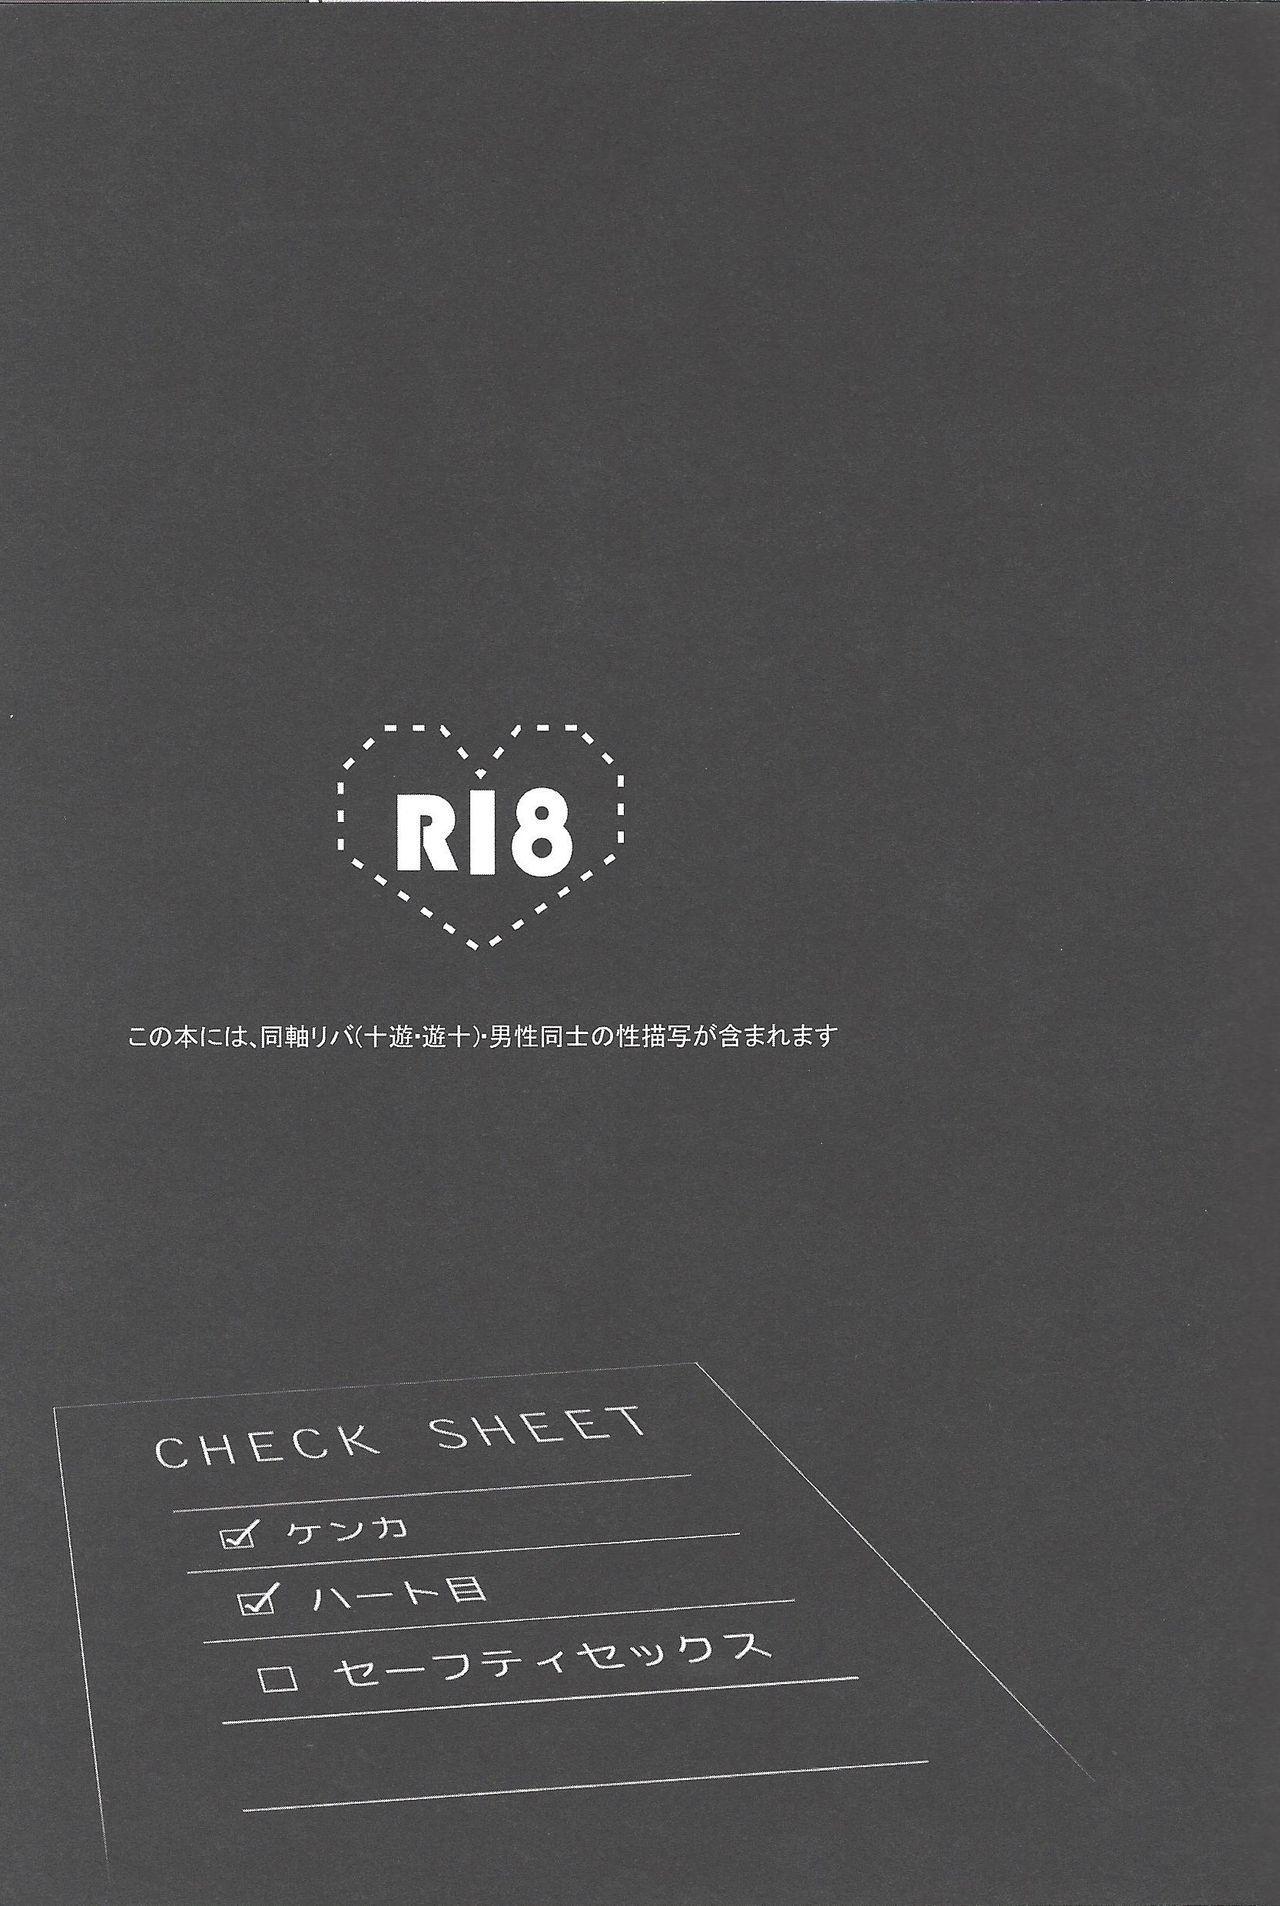 Reversible Check Sheet 1